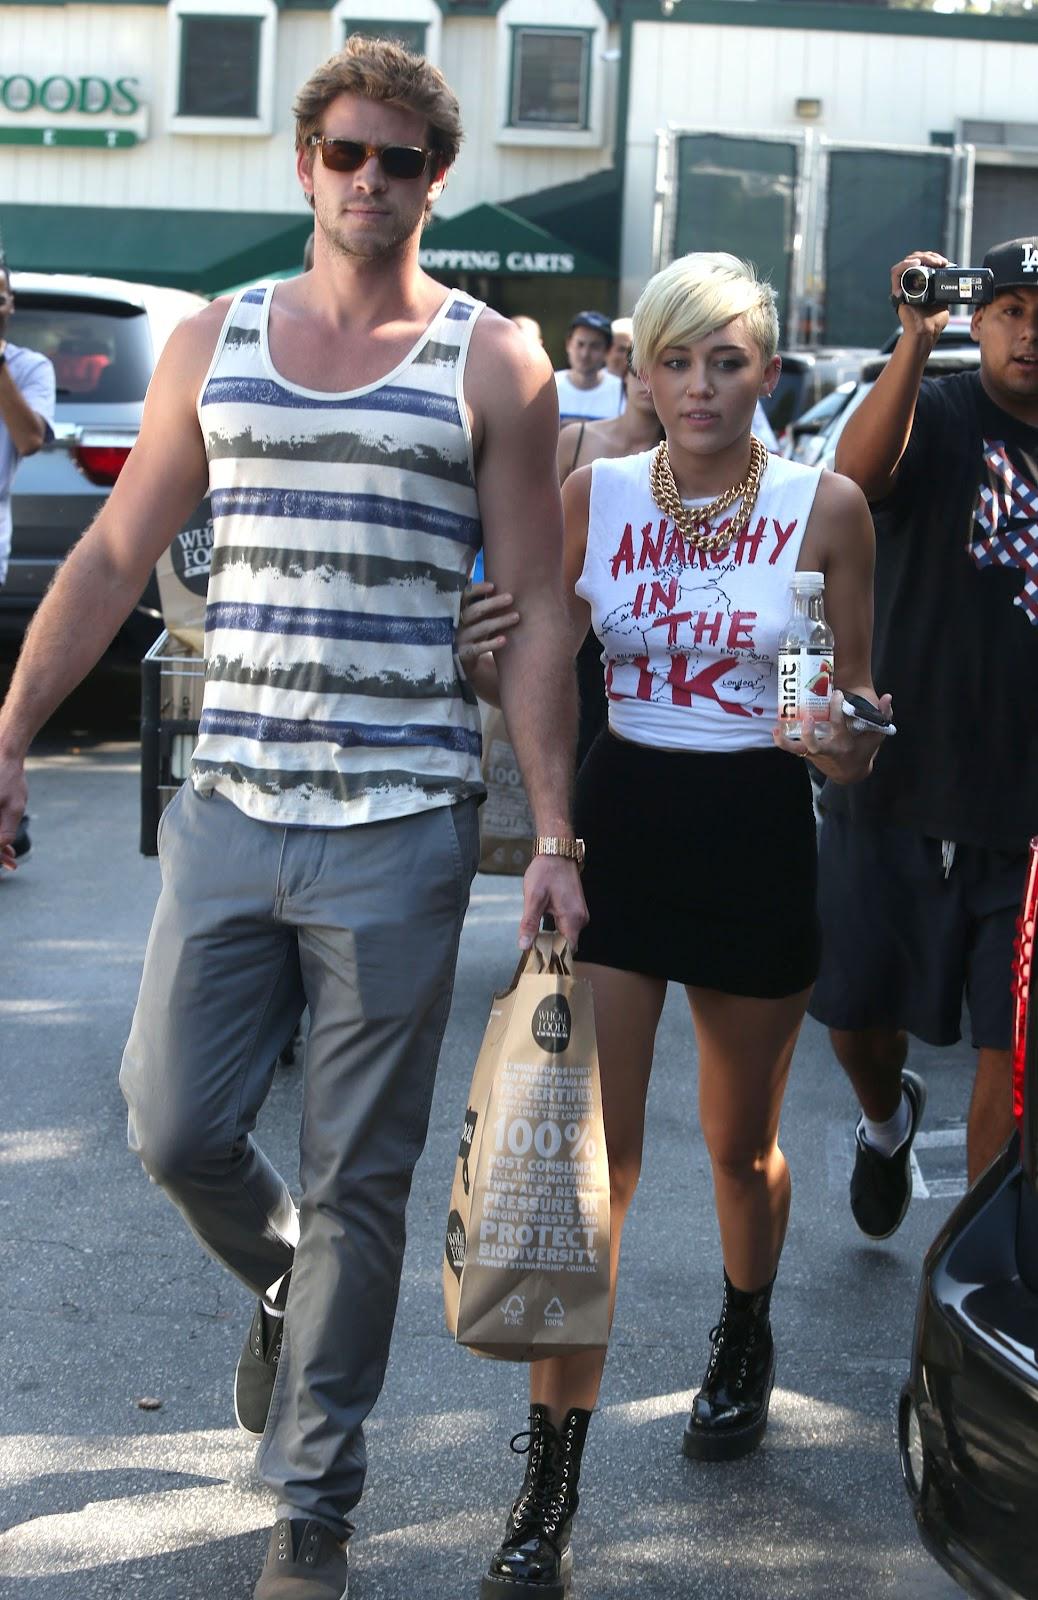 http://3.bp.blogspot.com/-I1Z5UJ3lcac/UFIL0nWDnoI/AAAAAAAAYAw/cX_KAw2HOlw/s1600/Miley+Liam.jpg